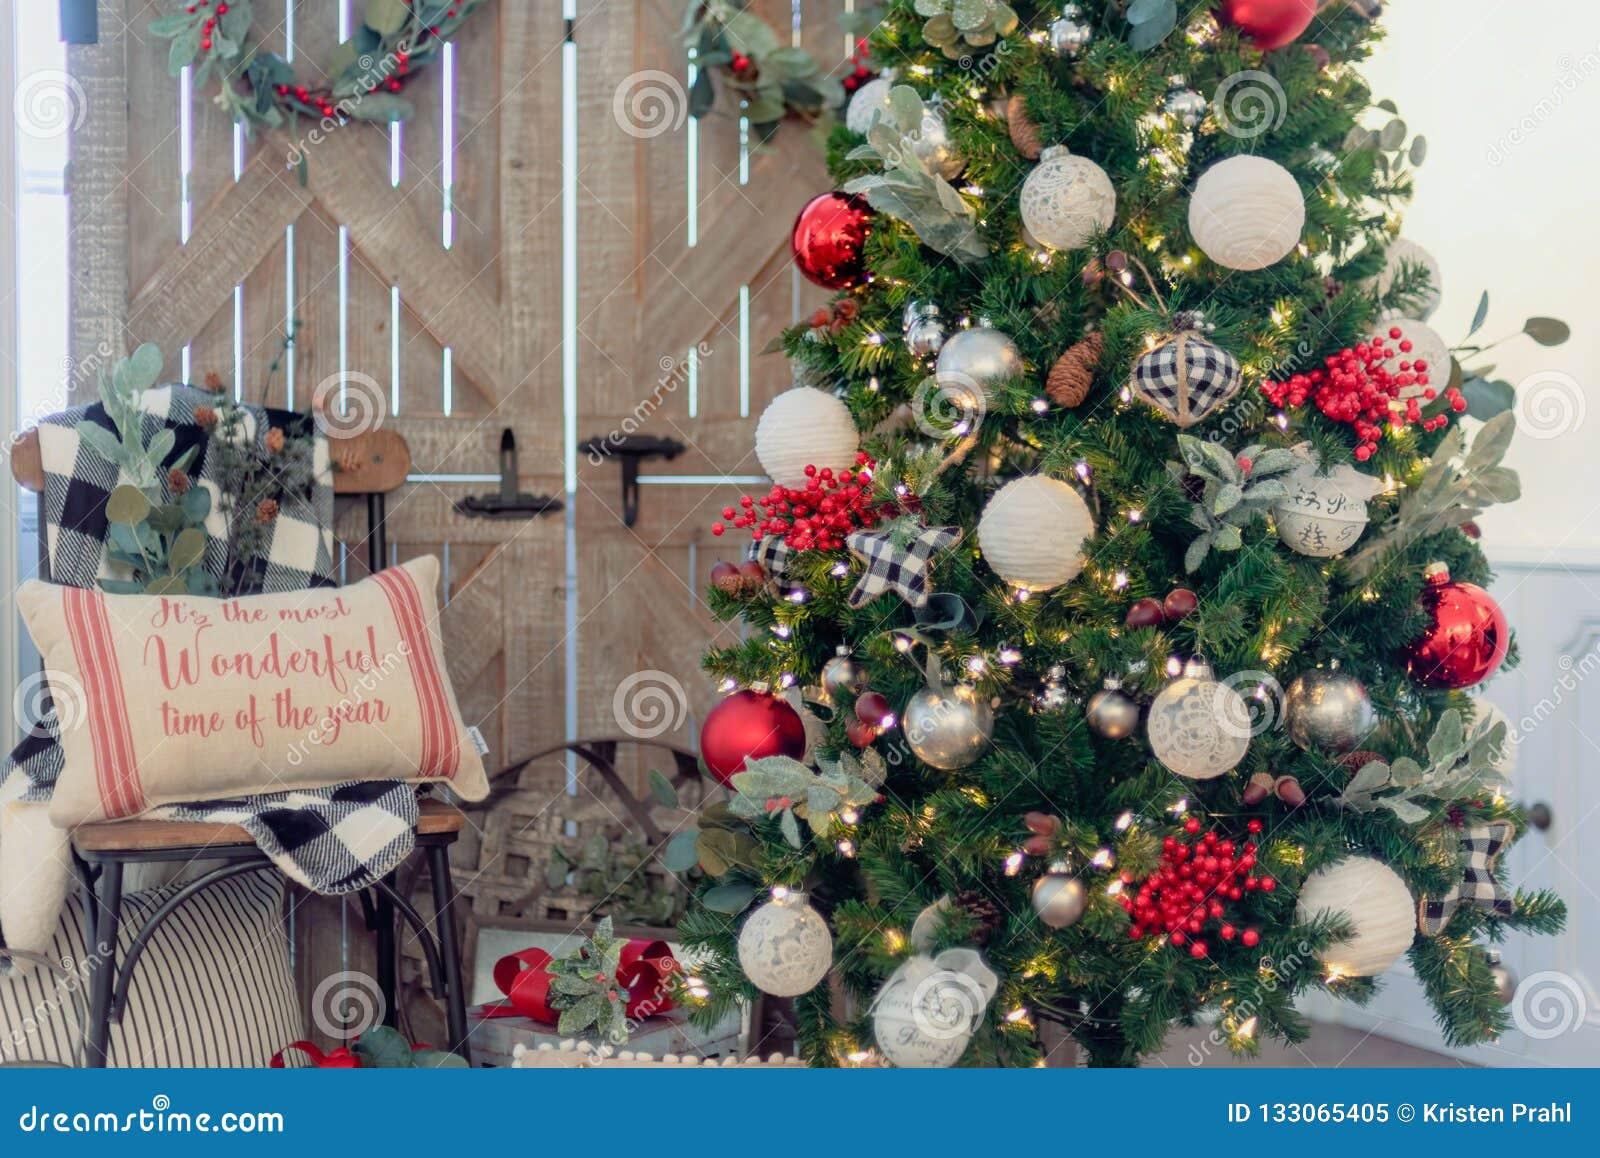 1 134 Farmhouse Christmas Photos Free Royalty Free Stock Photos From Dreamstime